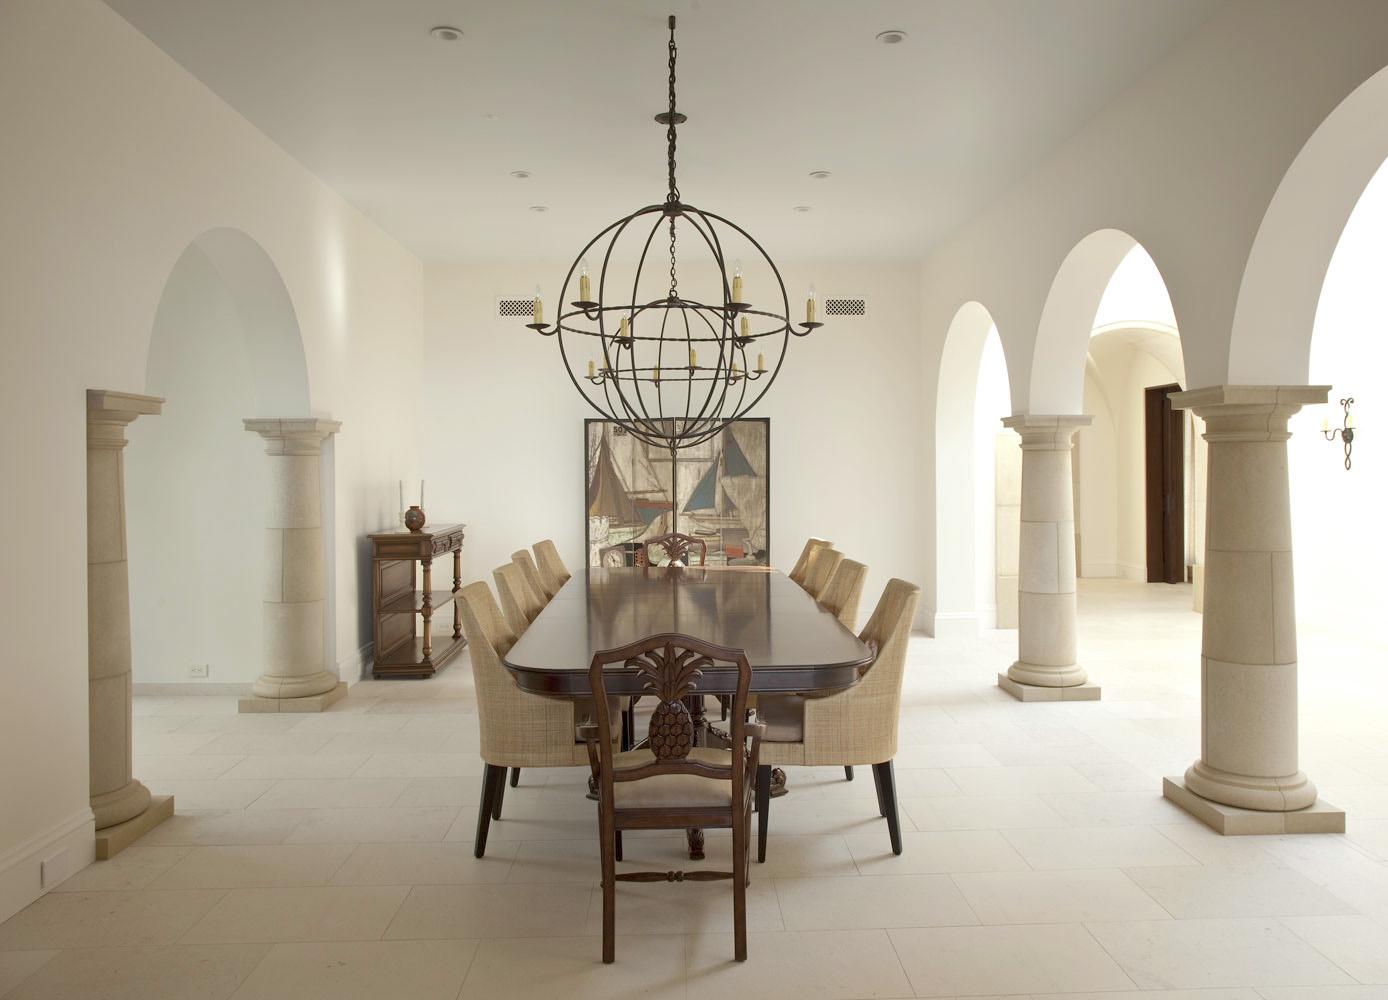 Modern-Spanish-Minimalist-Dining-Room-Archway-Stone-Columns-Corbin-Reeves.jpg